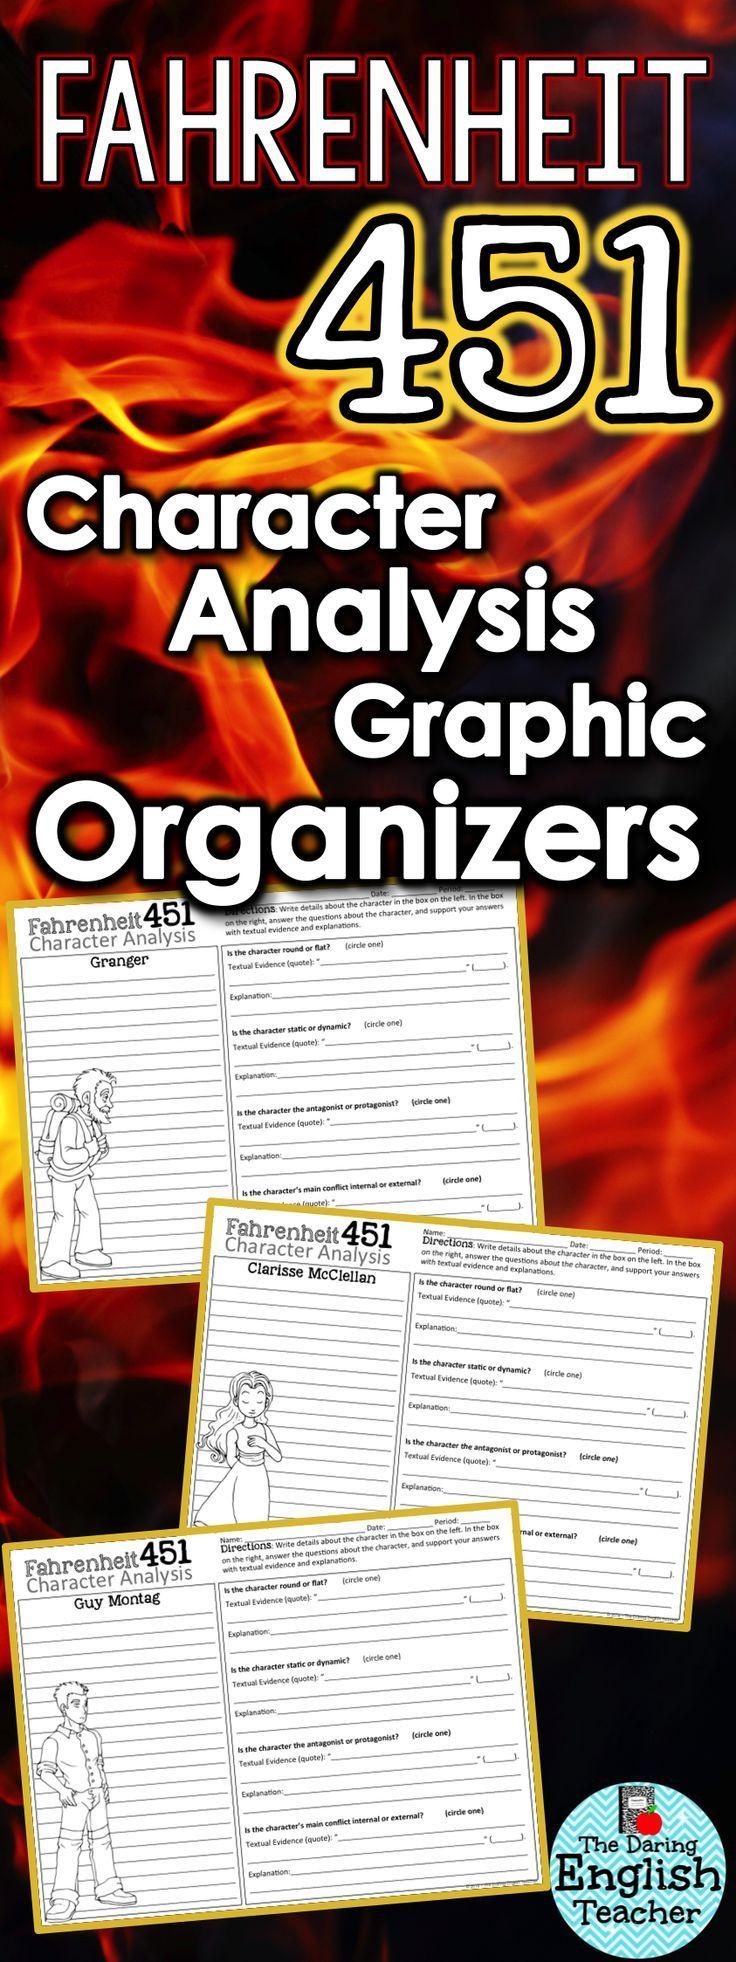 best teaching fahrenheit images fahrenheit fahrenheit 451 character analysis graphic organizers